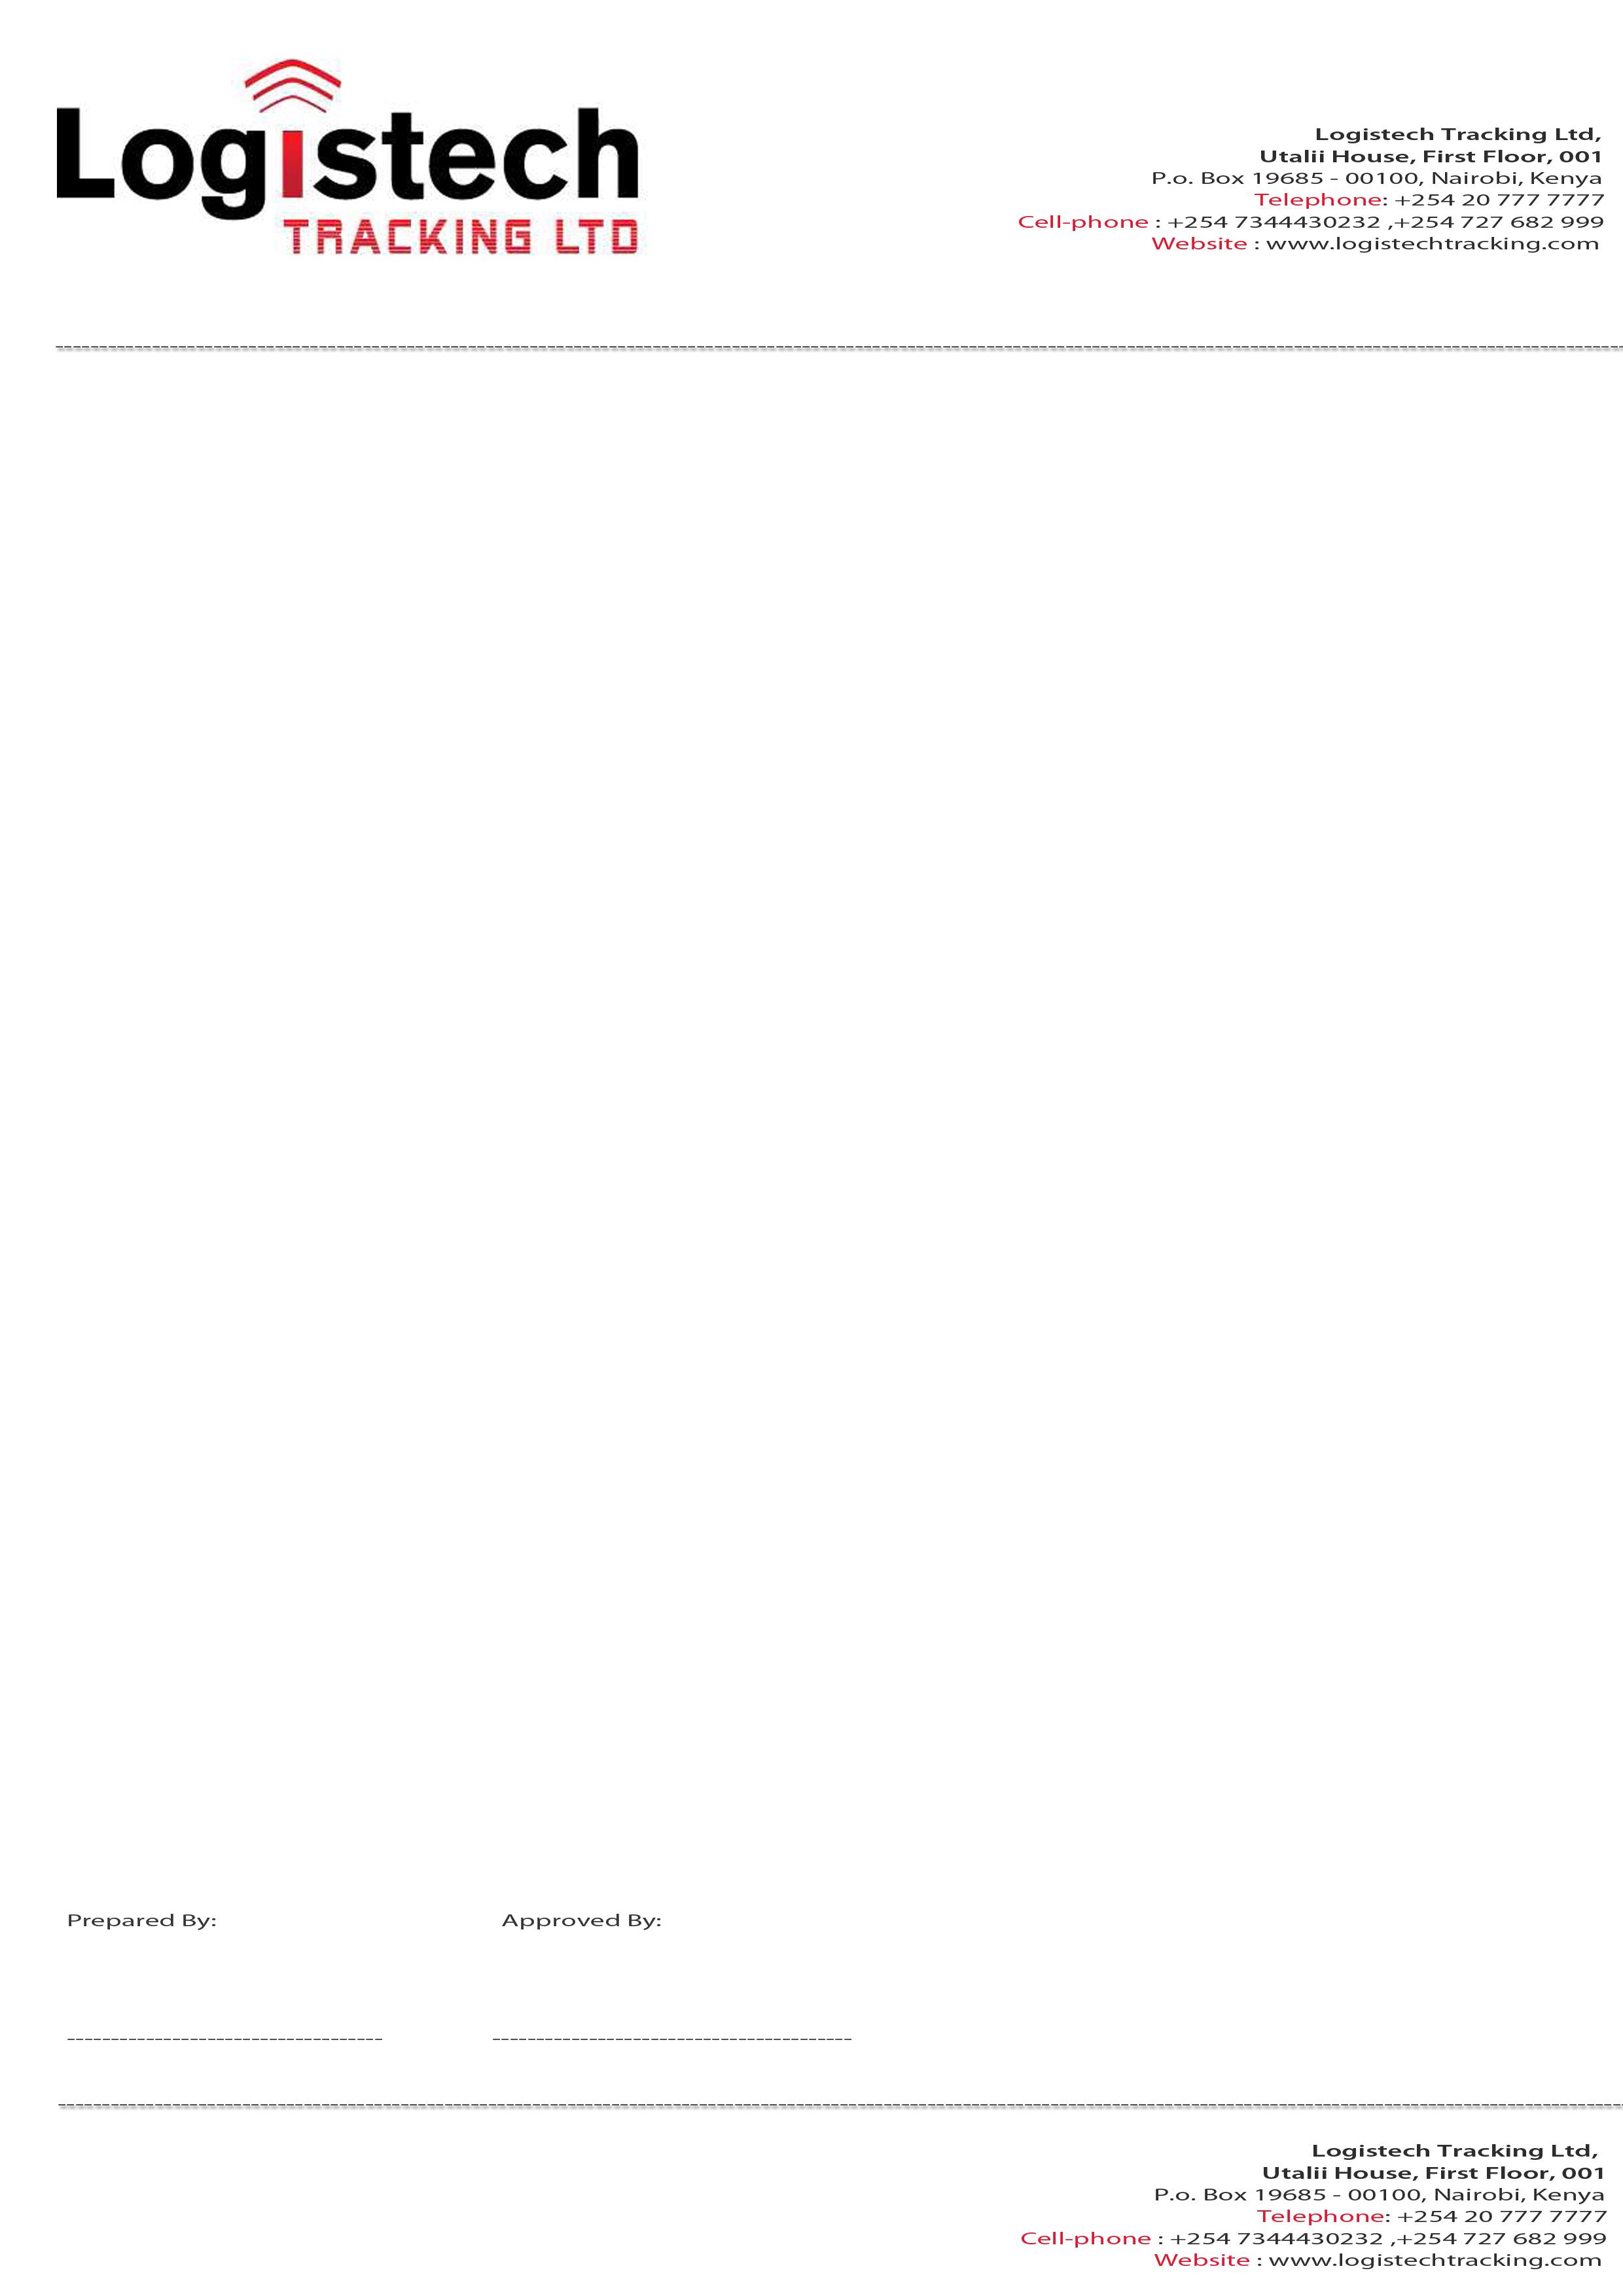 Letterheads The Print Experts Ltd – Company Letterheads